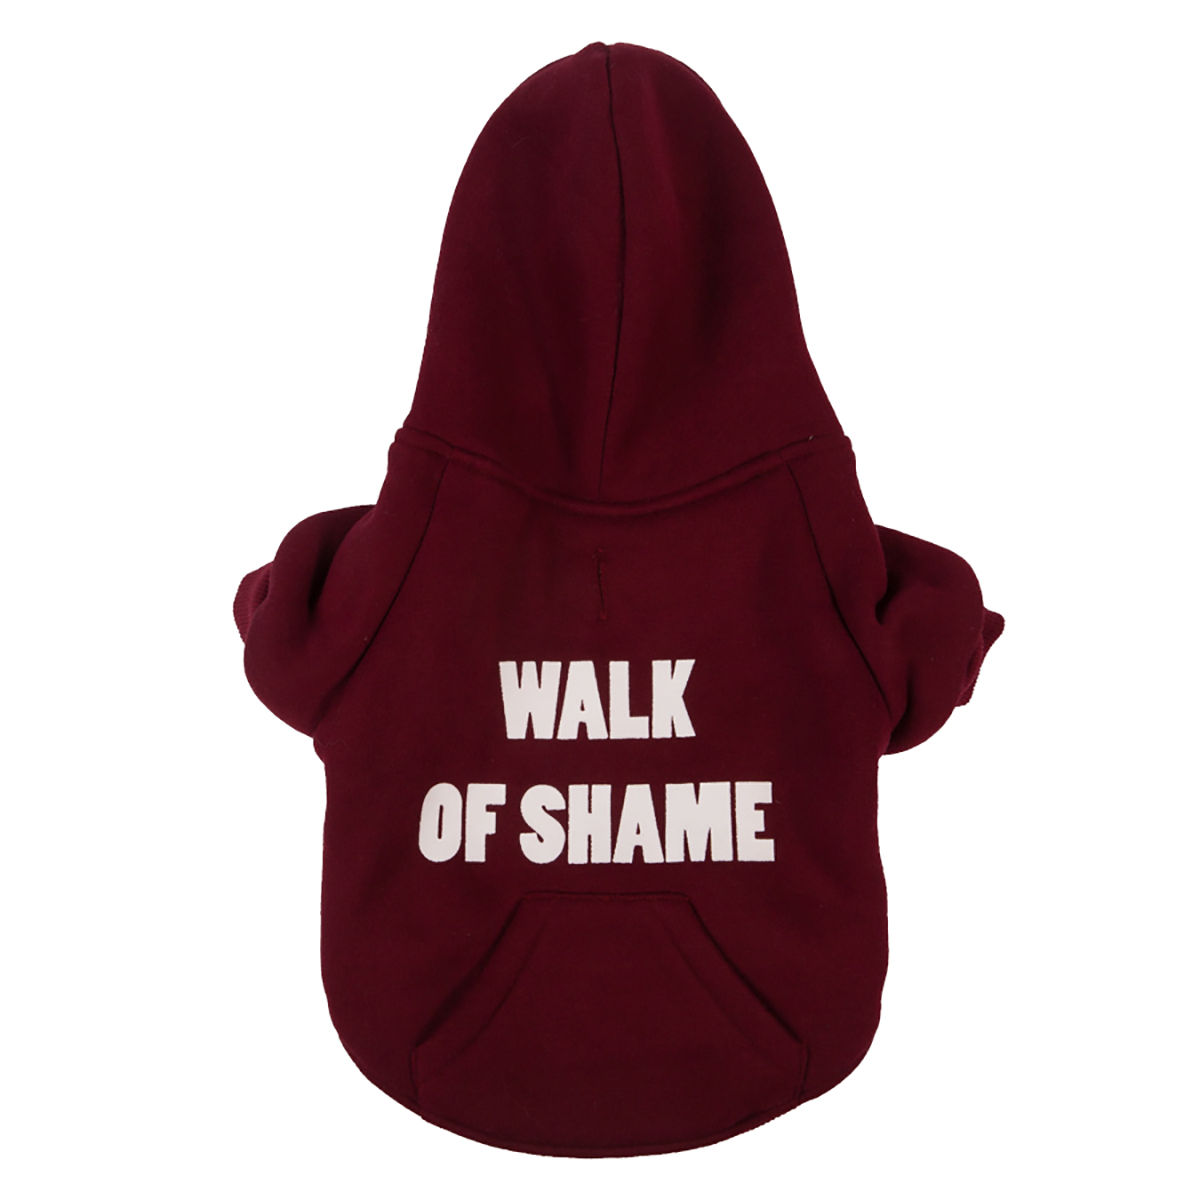 fabdog® Walk of Shame Thermal Lined Dog Hoodie - Burgundy